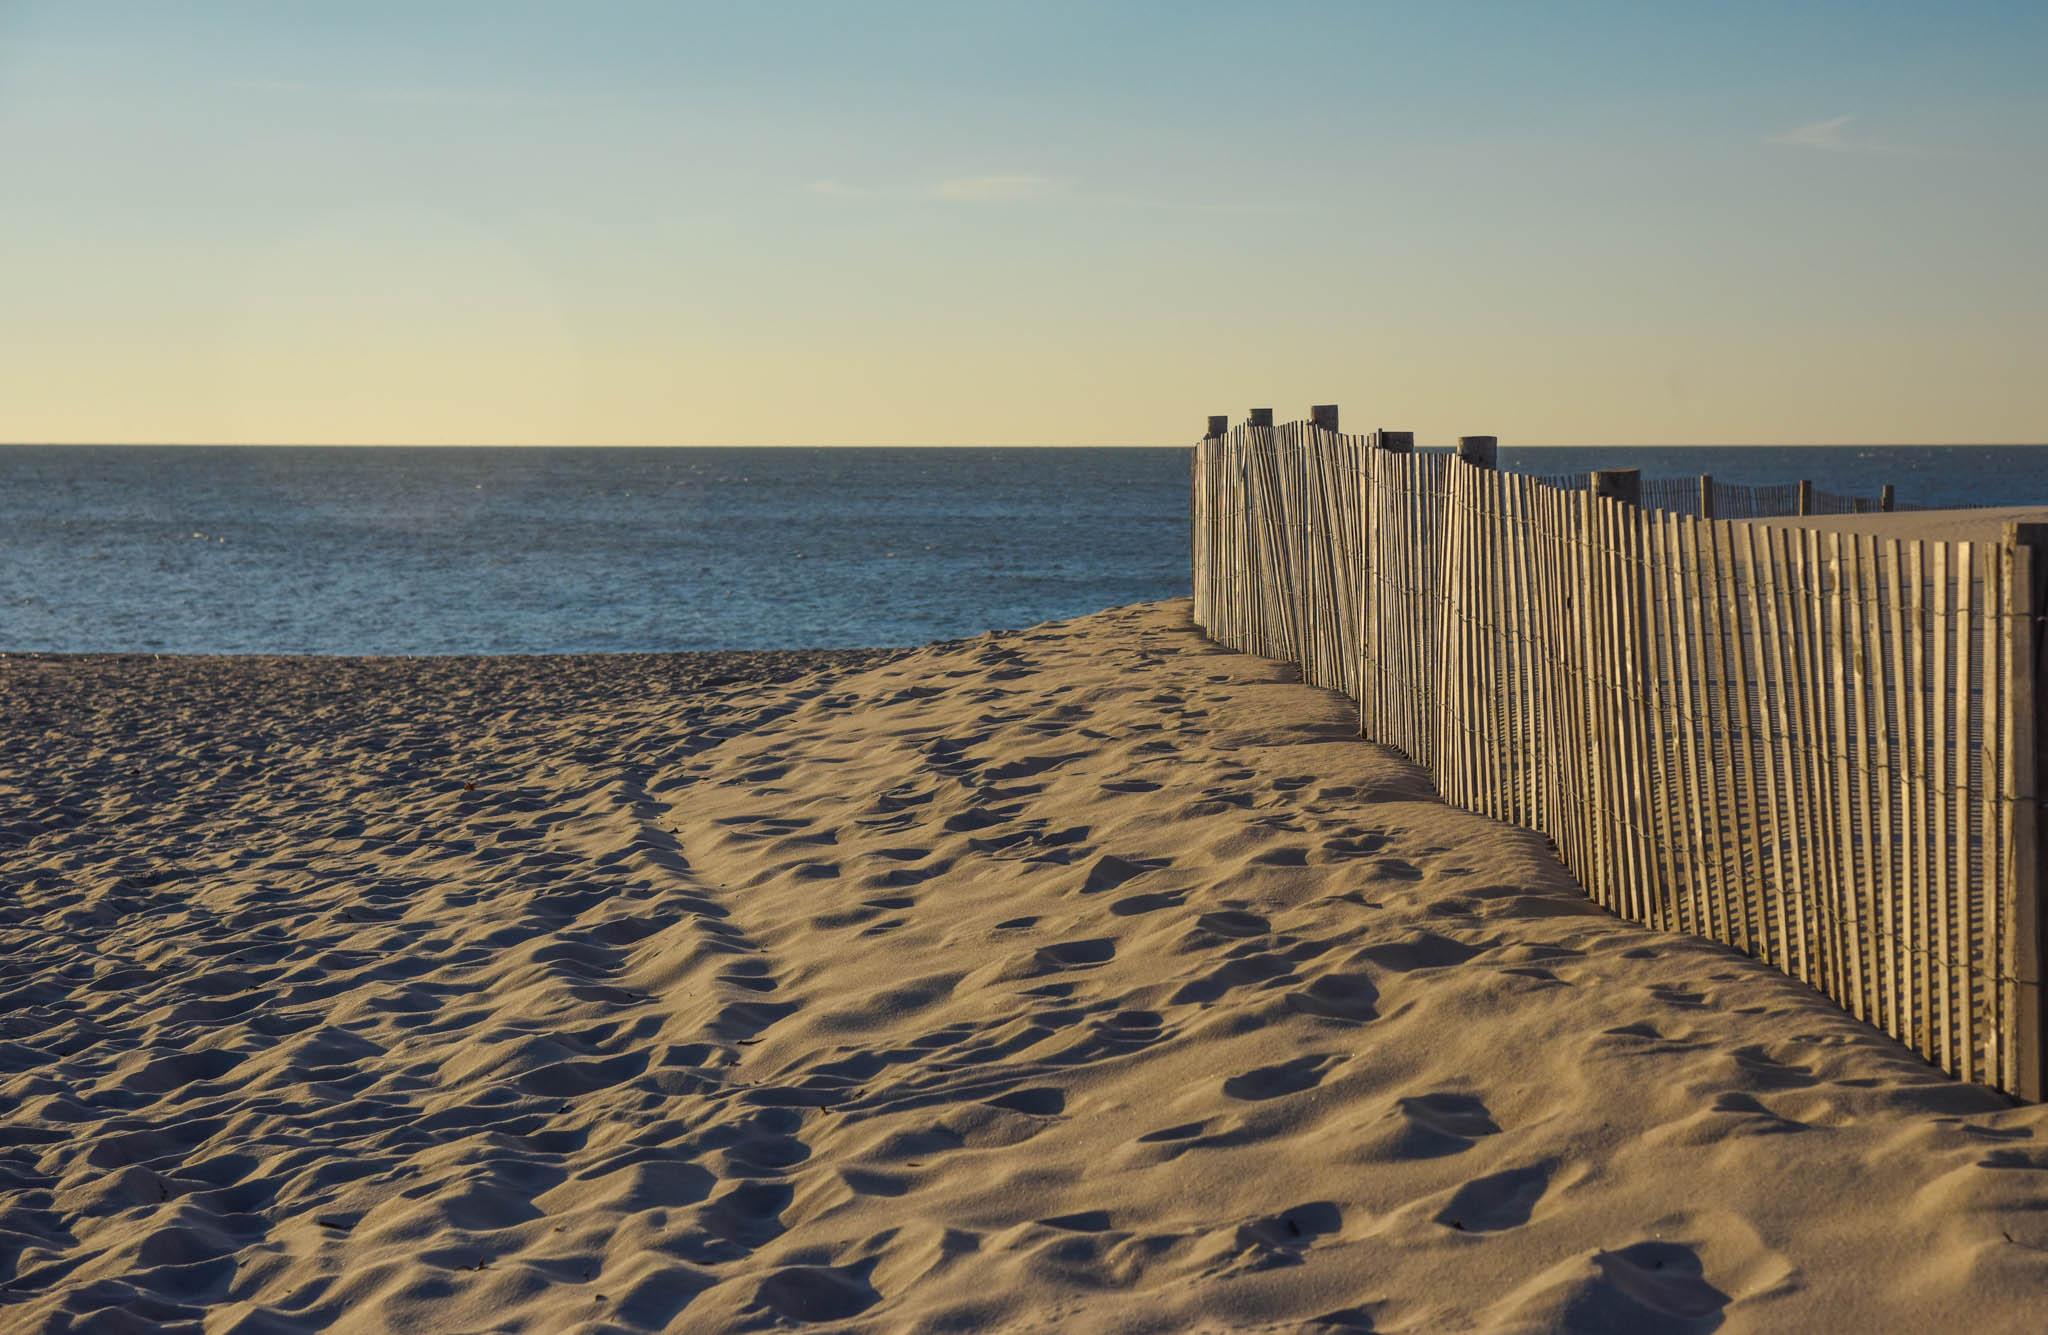 sunrise next to the dunes